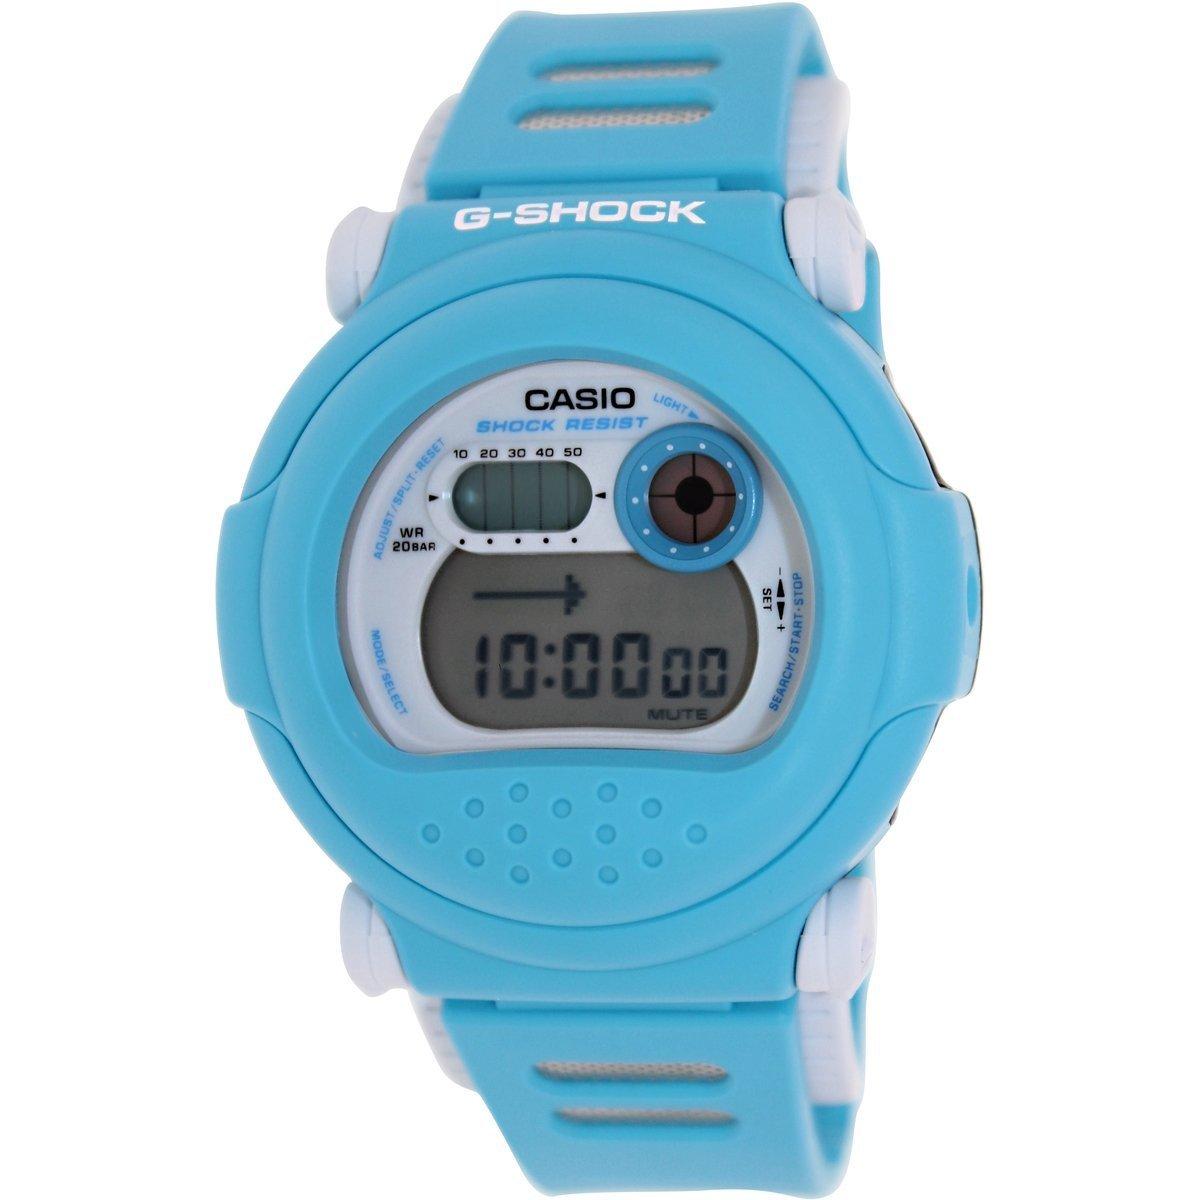 Casio Men's G-Shock G001SN-2 Blue Plastic Quartz Watch with Digital Dial at Sears.com